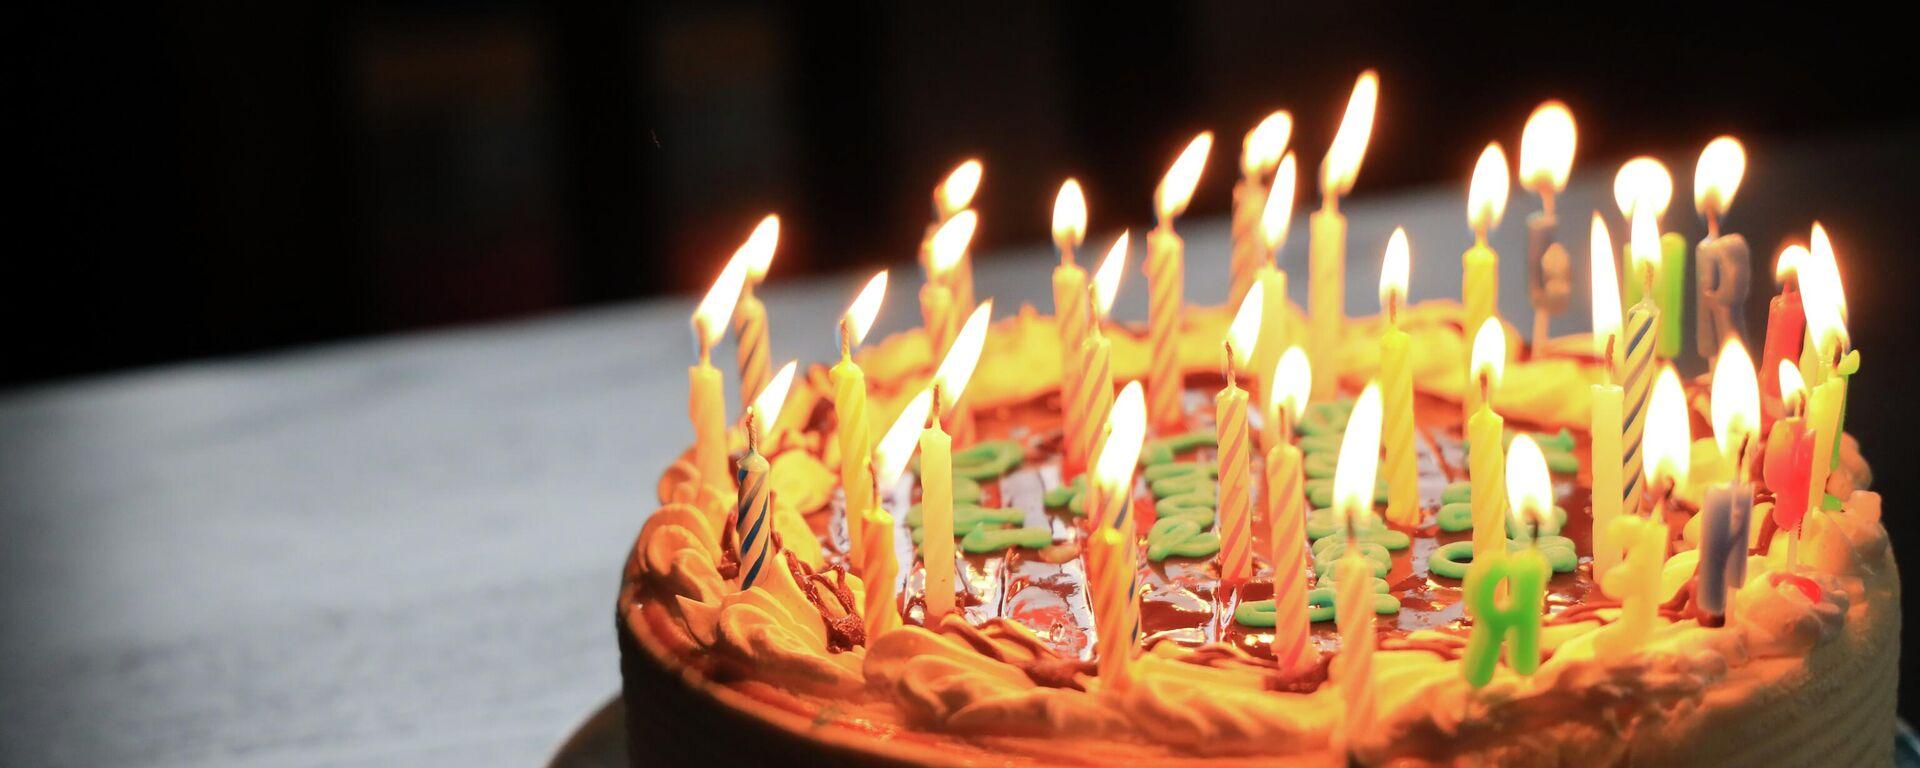 Una torta de cumpleaños - Sputnik Mundo, 1920, 12.07.2021